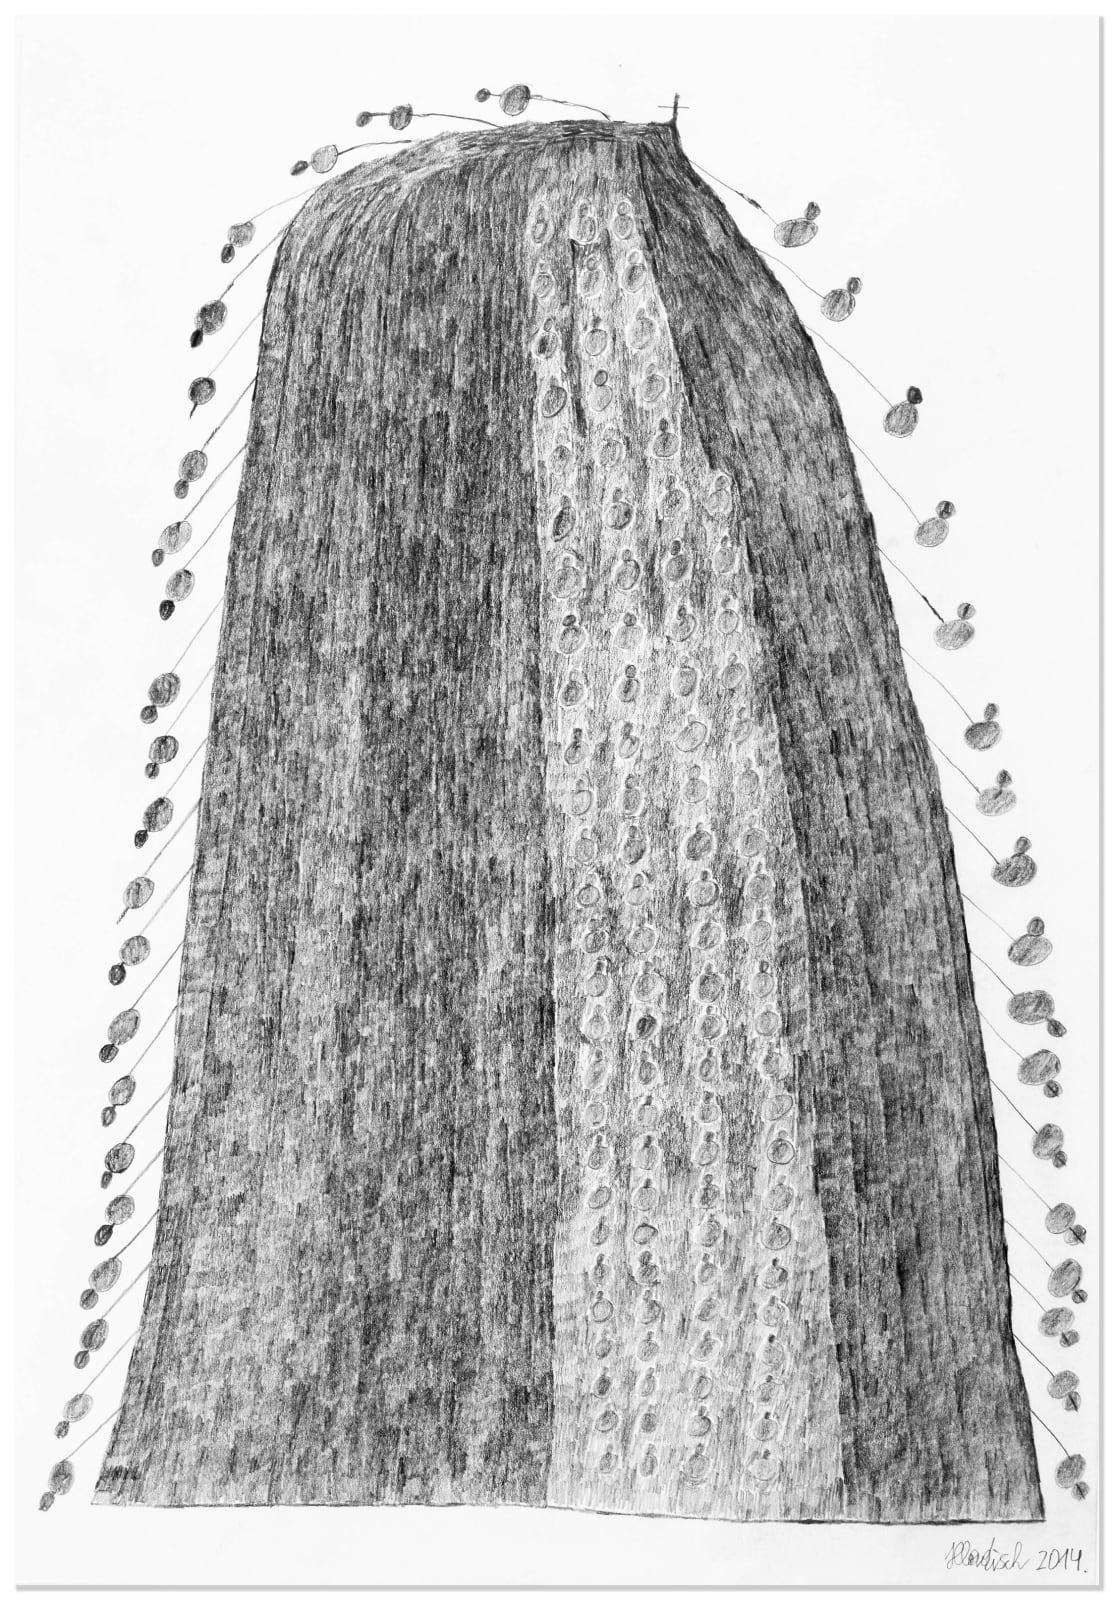 LEMON TREE, 2014 Graphite on paper 18.8 x 13 in. (47.8 x 33 cm) HH 9 $3,600